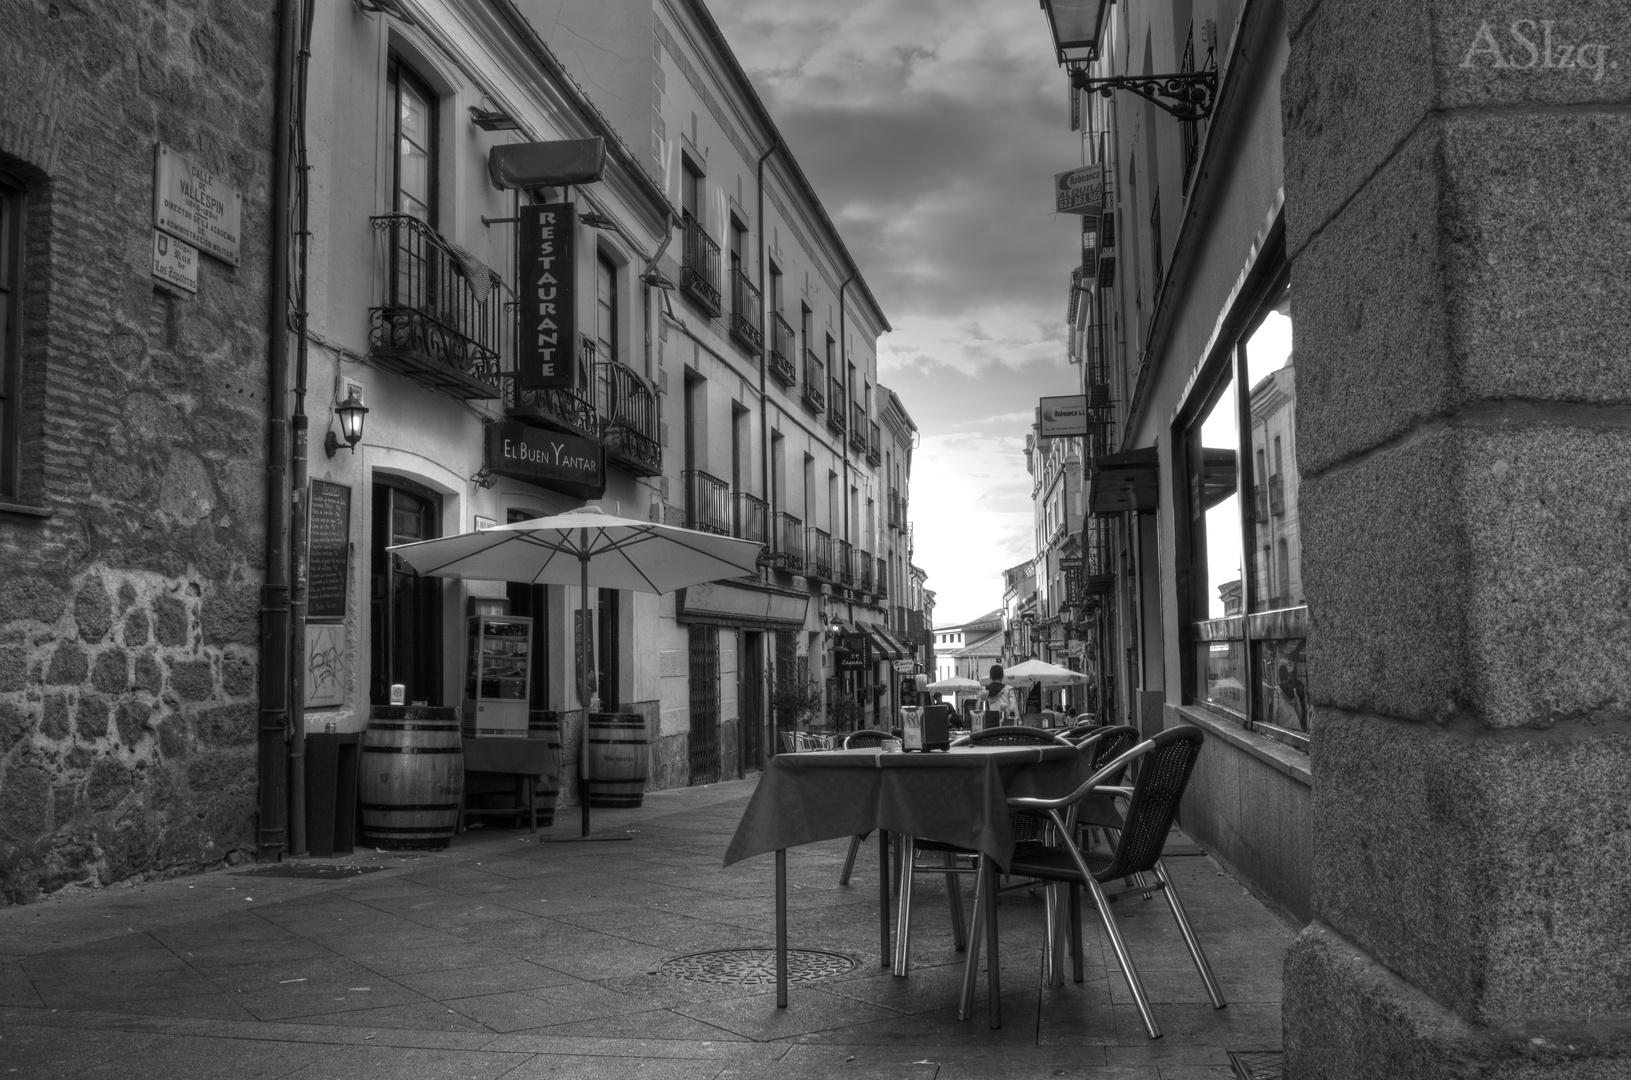 Ávila calle en B&N